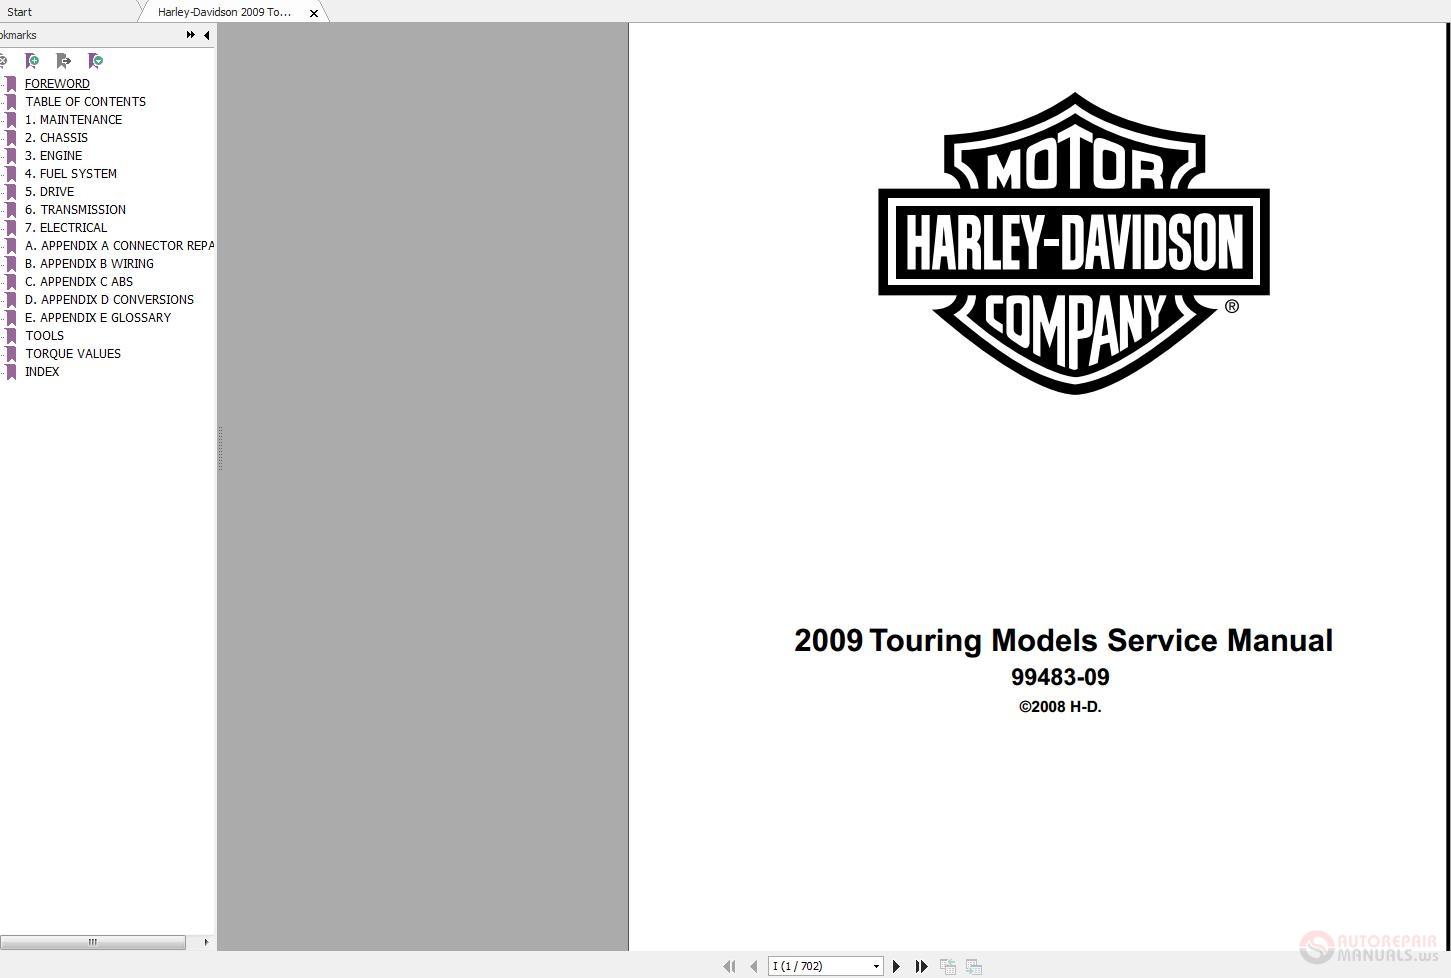 harley-davidson 2009 touring models service manual